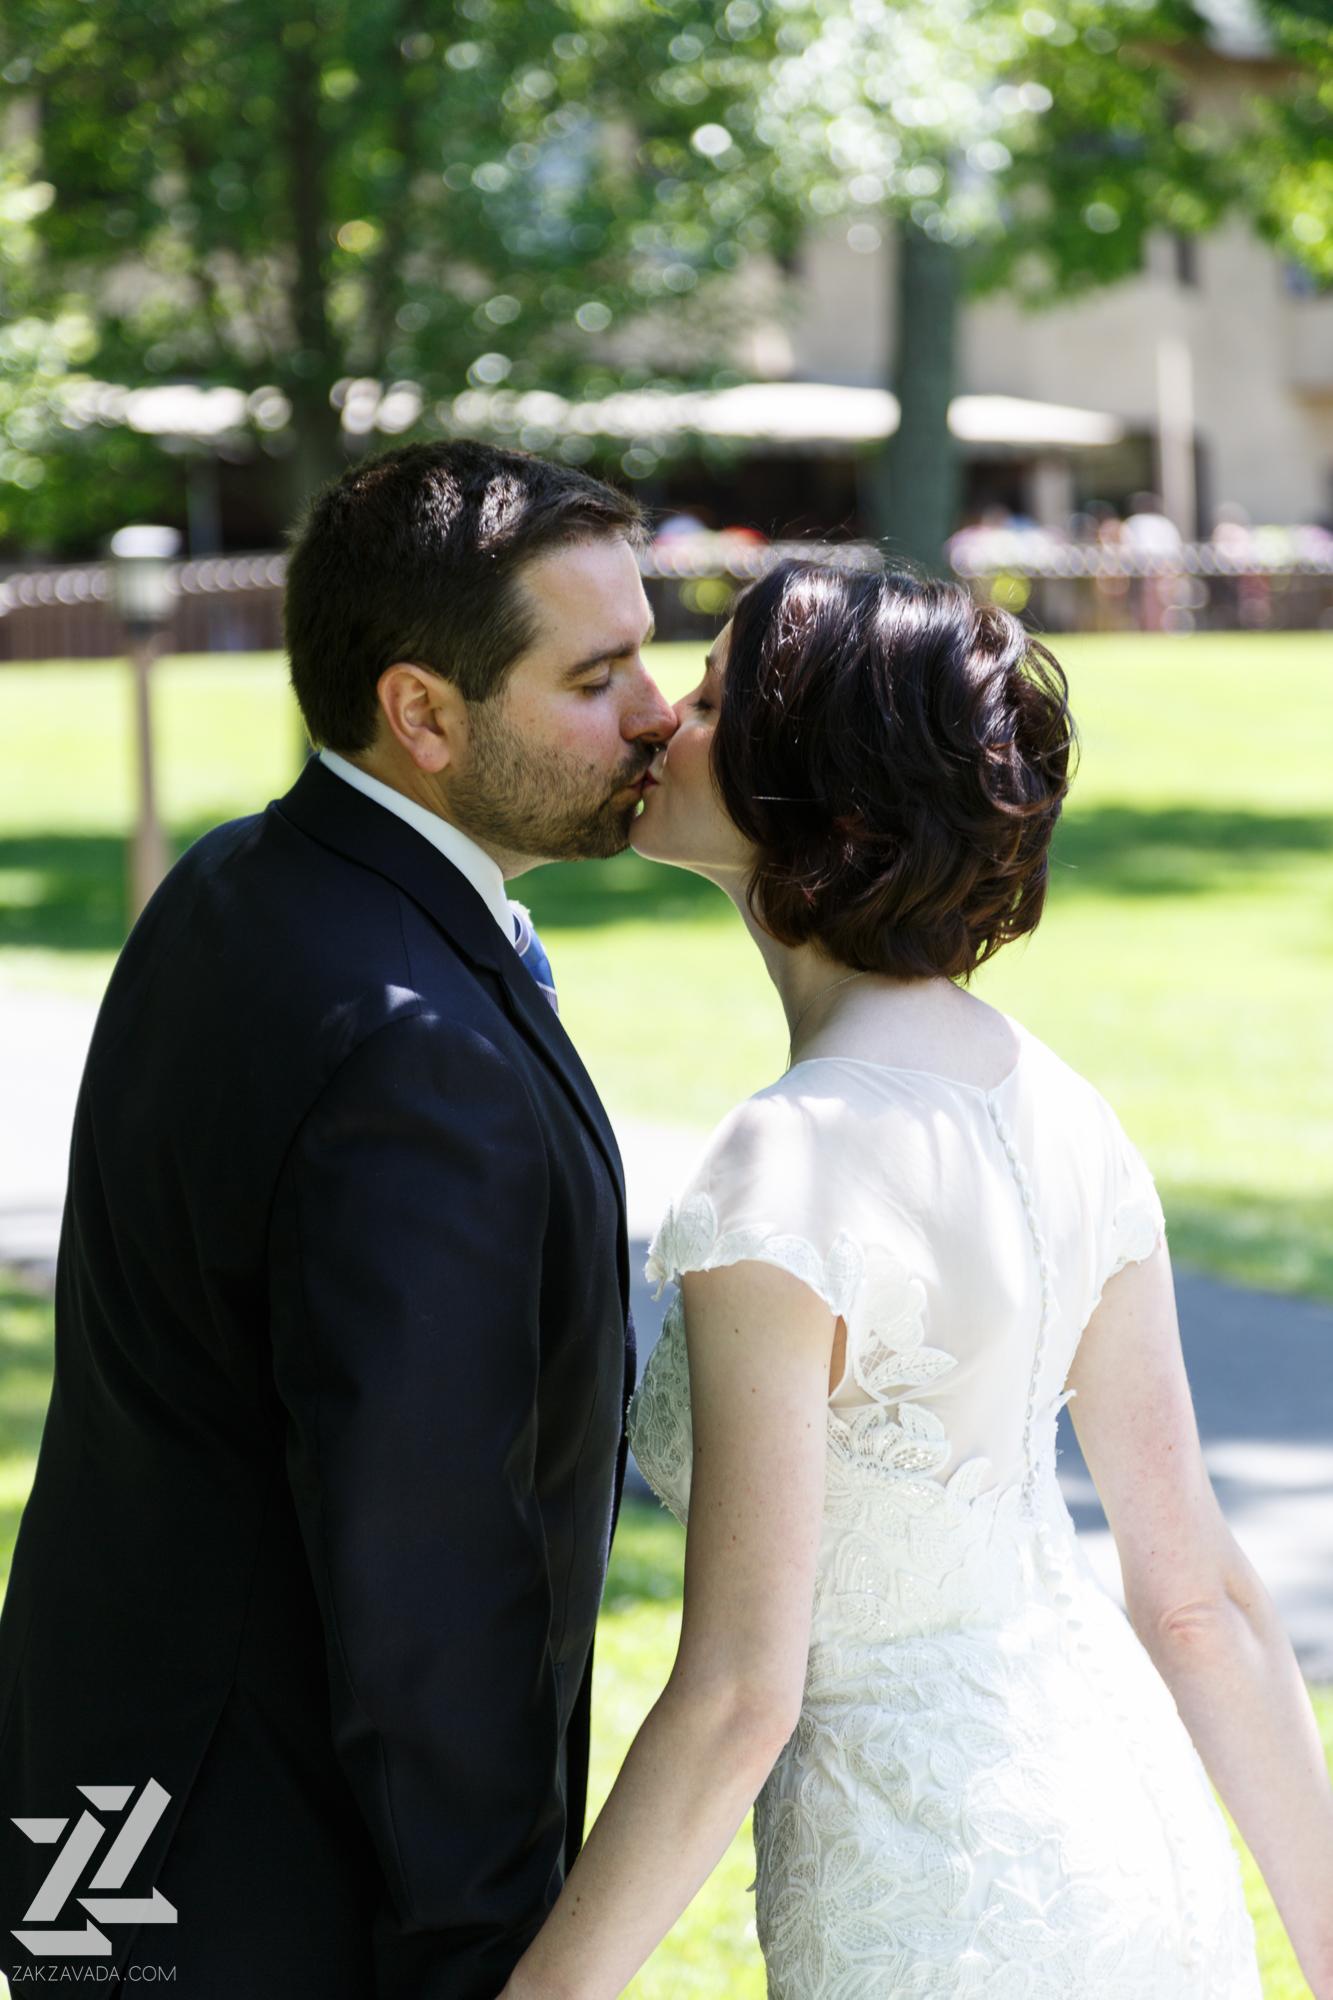 scranton-wedding-photography-zak-zavada-ruddyBelcastroWedding-662.jpg